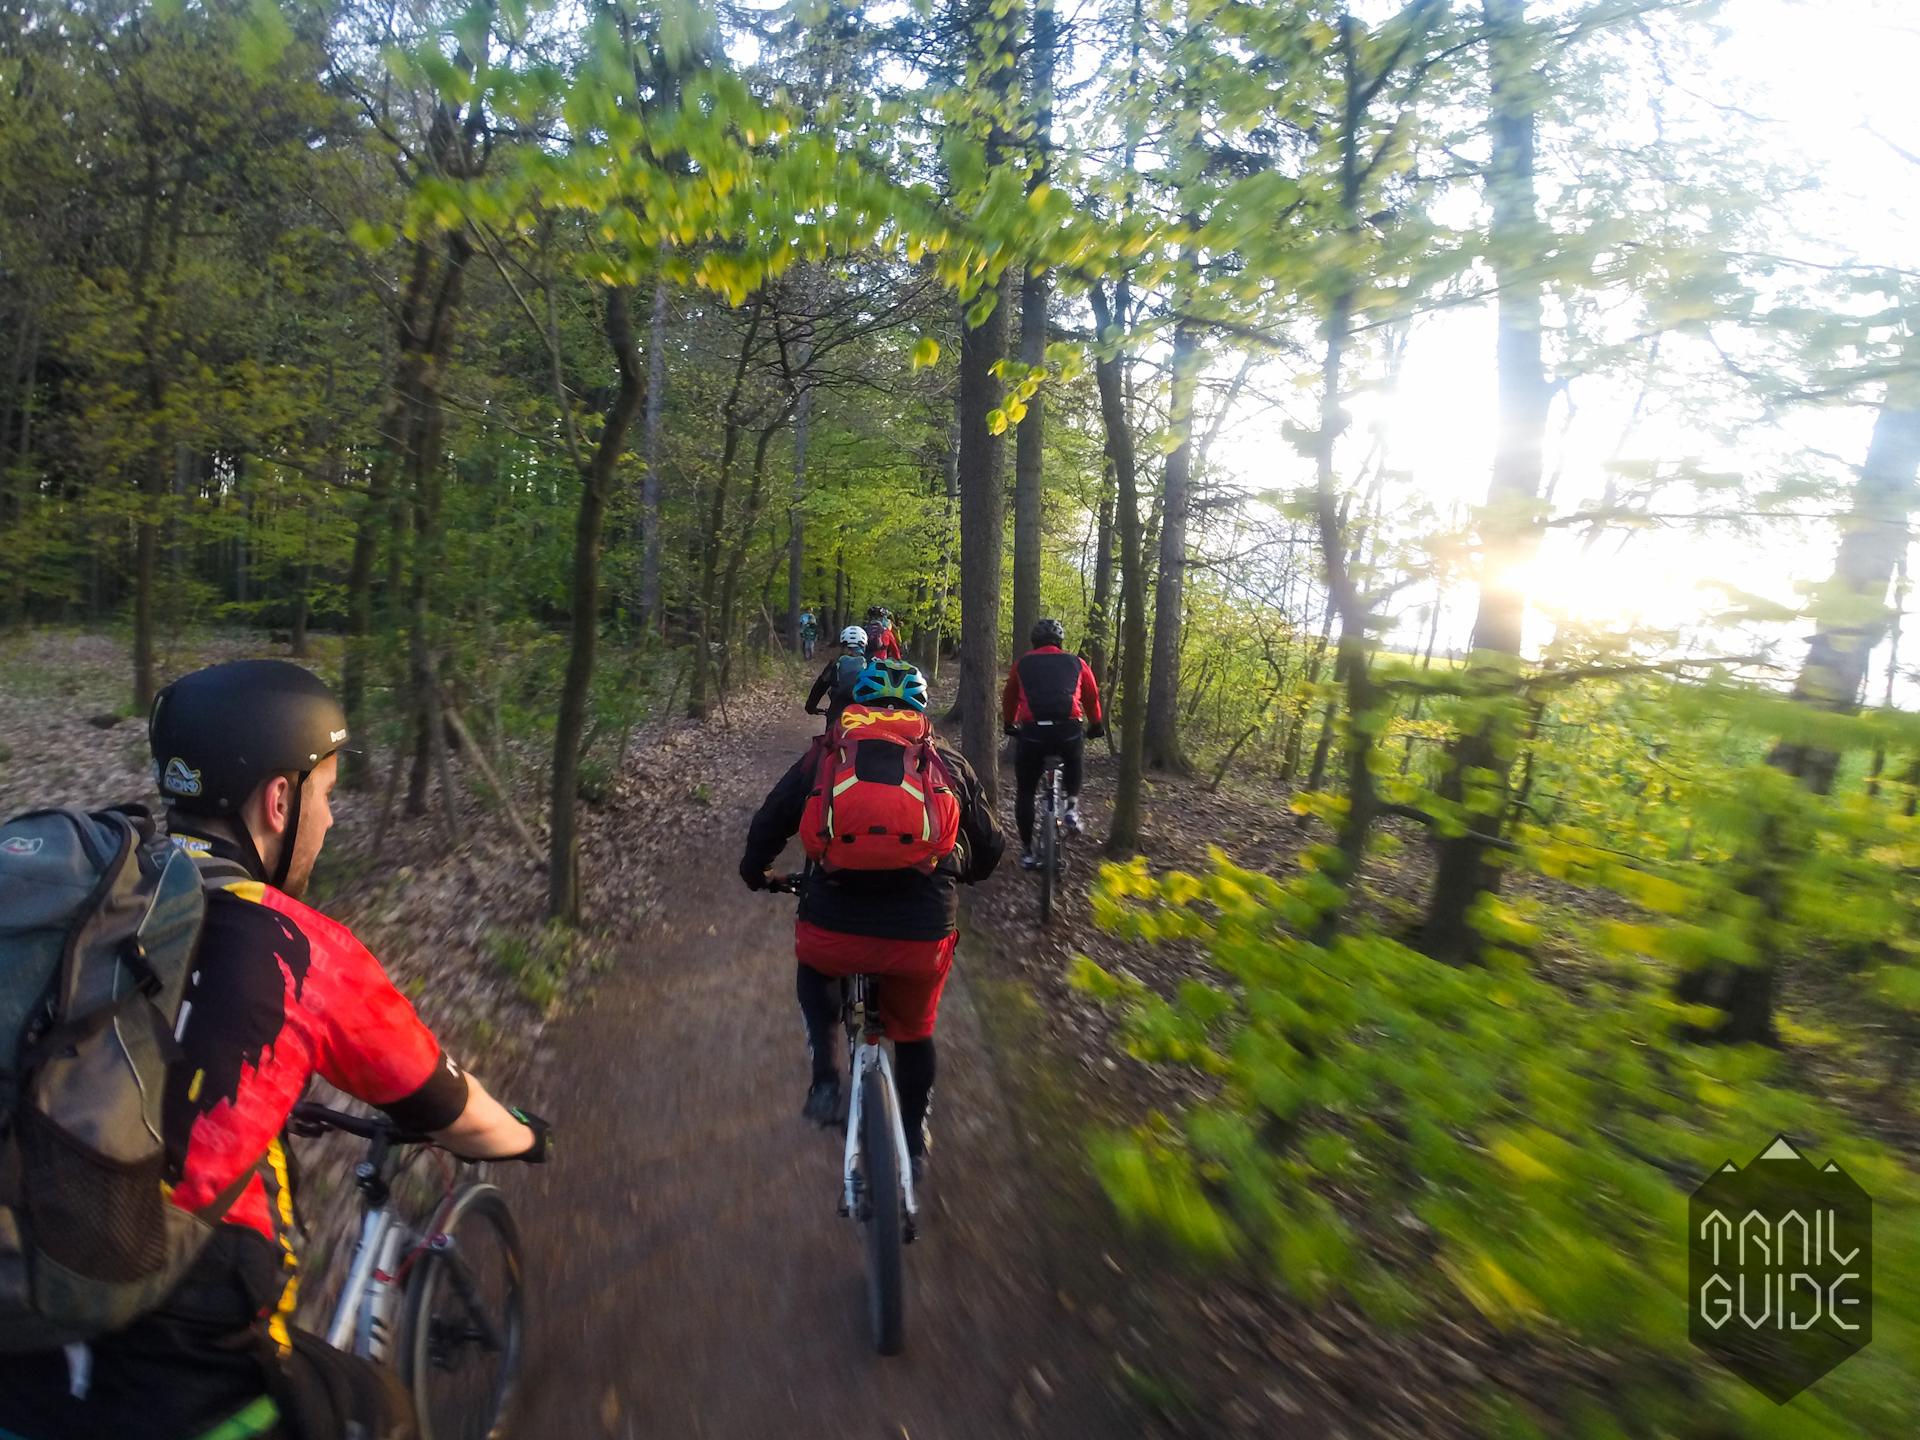 MTB-vyjizdka-easy-hobby-trail-guide5_ttrzqz.jpg